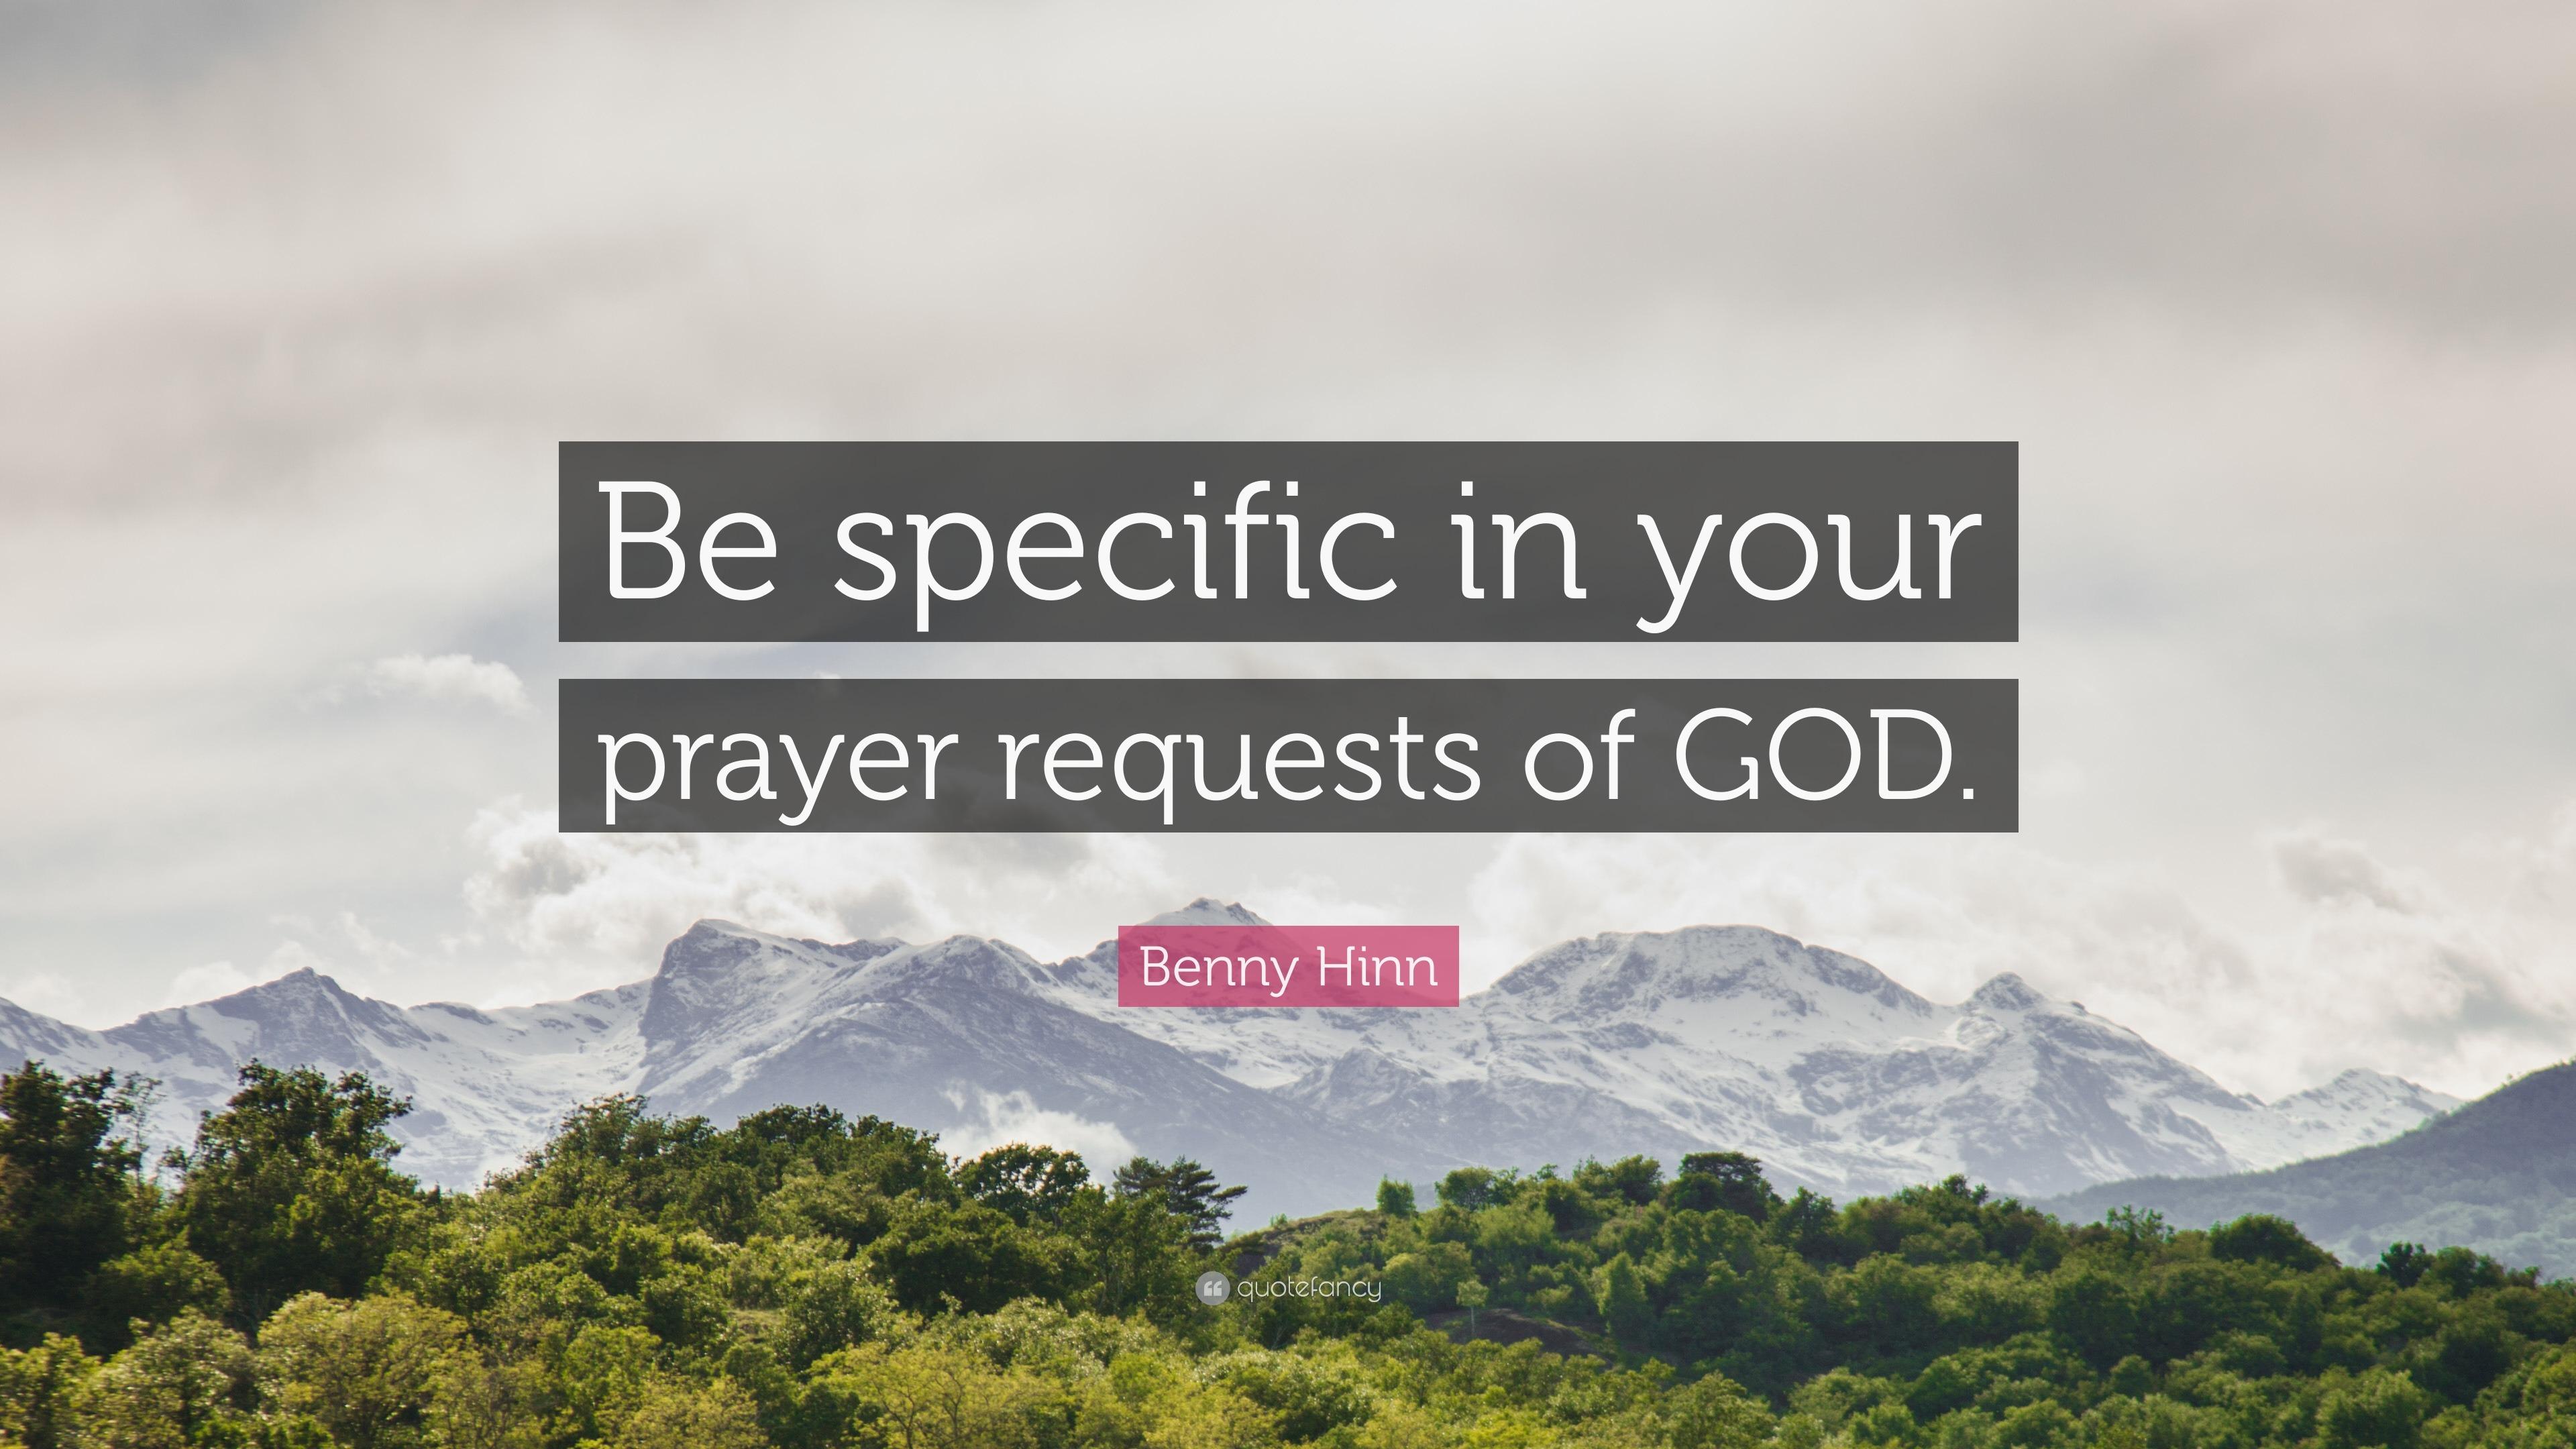 Benny Hinn Prayer Request